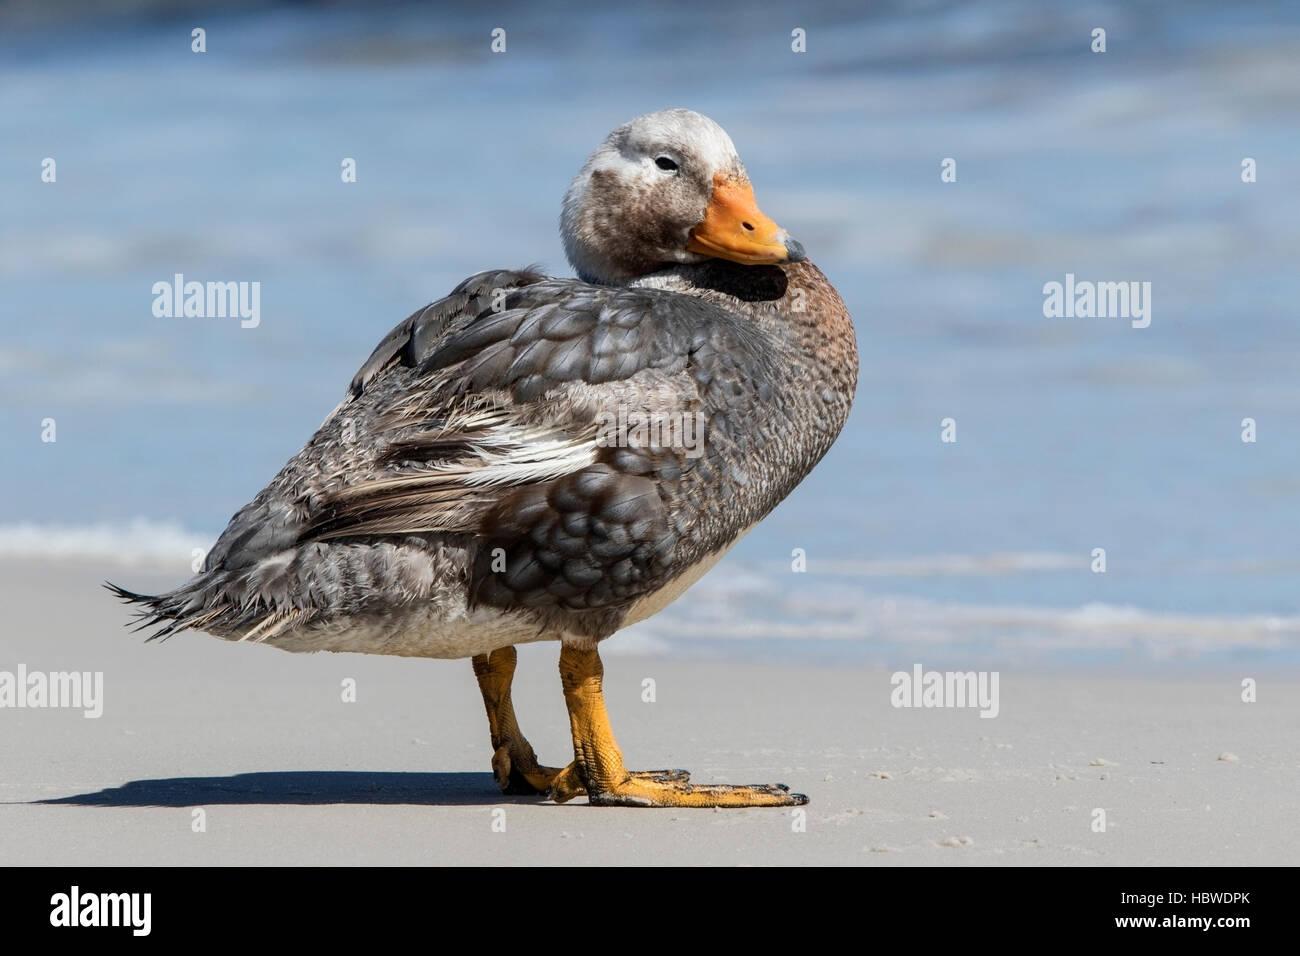 Falkland islands flightless steamer duck (Tachyeres brachypterus) adult male standing on sandy beach, Falkland Islands - Stock Image